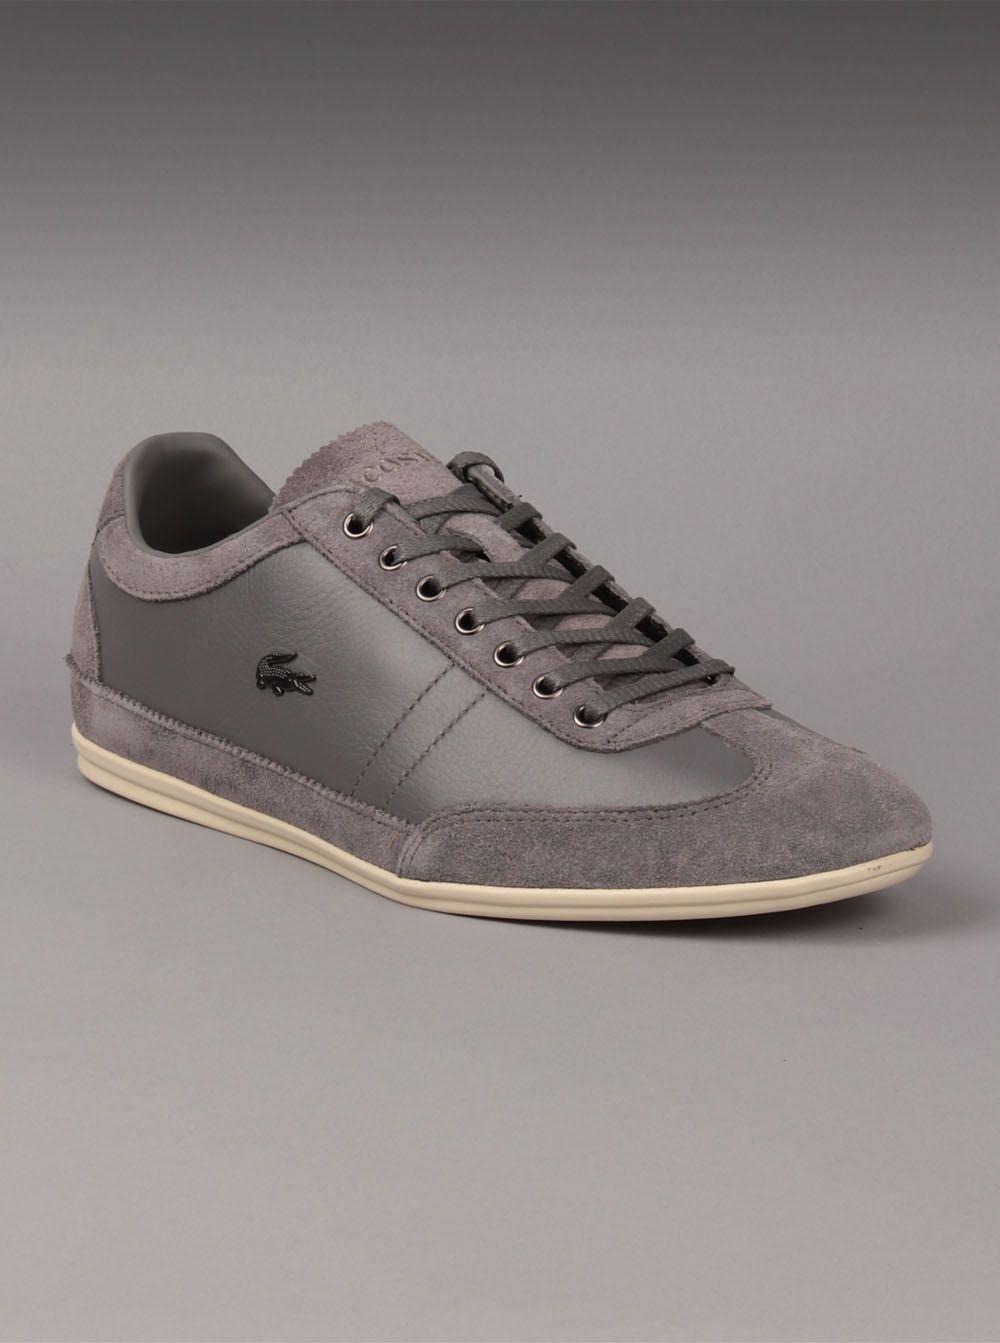 1cd8ee026399cd Lacoste® Mens Misano 11 Sneaker in Dark Grey. The Lacoste mens Misano 11  suede